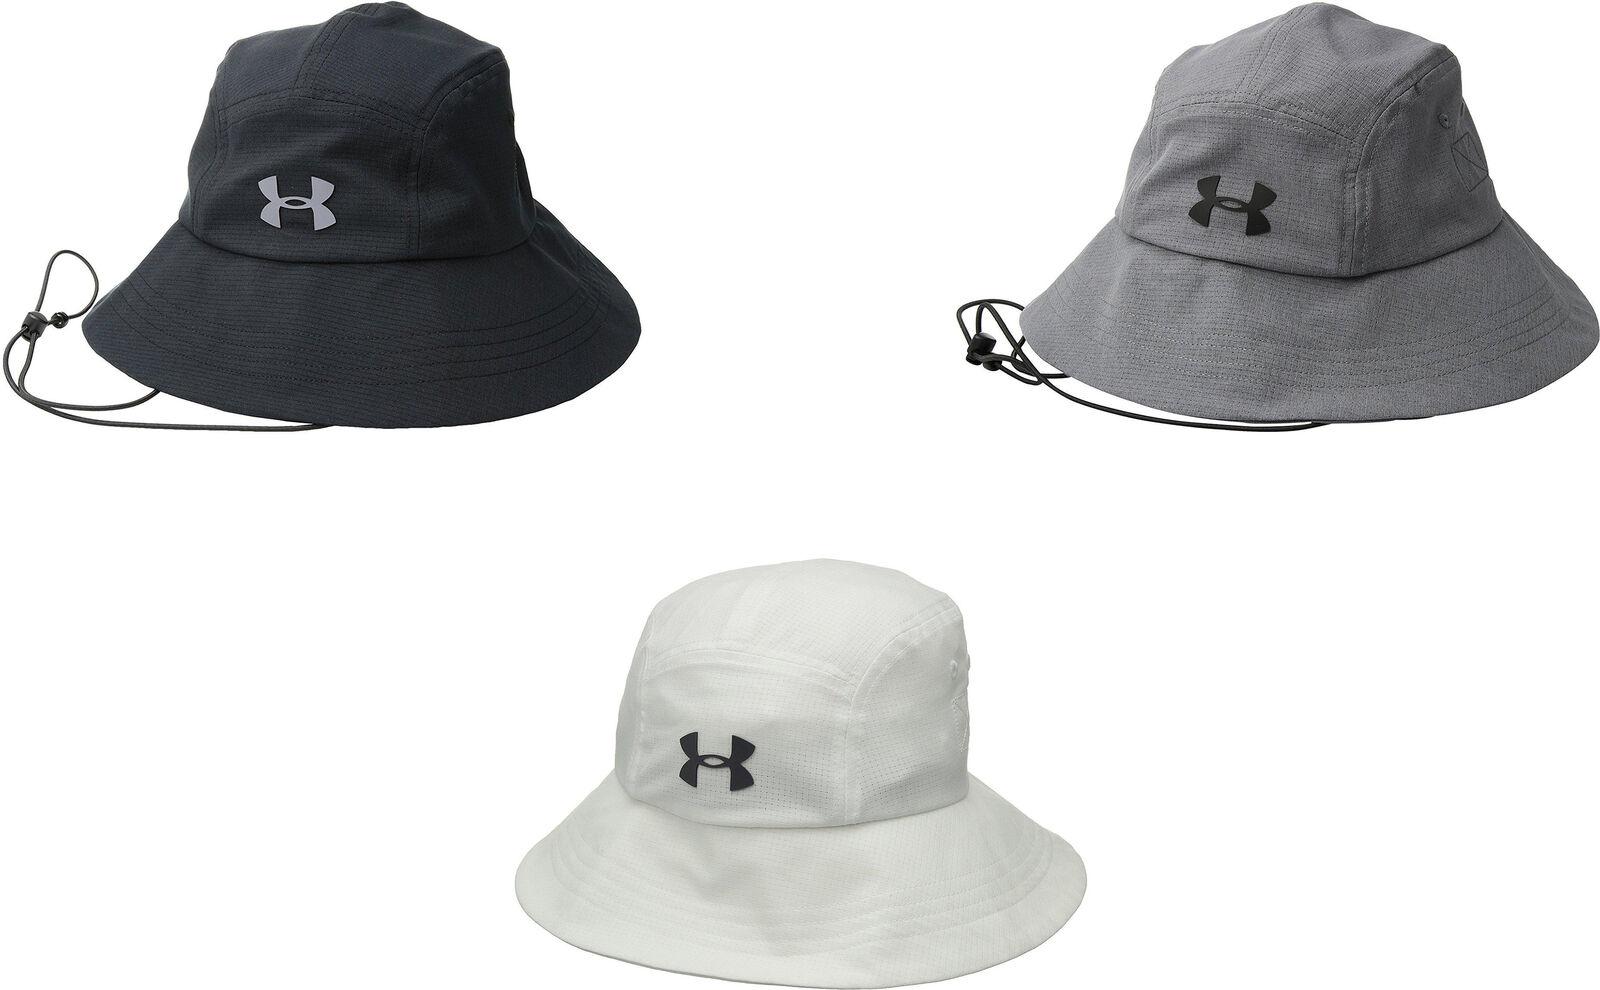 04c83879c8c Under Armour Men s ArmourVent Warrior Bucket 2.0 Hat